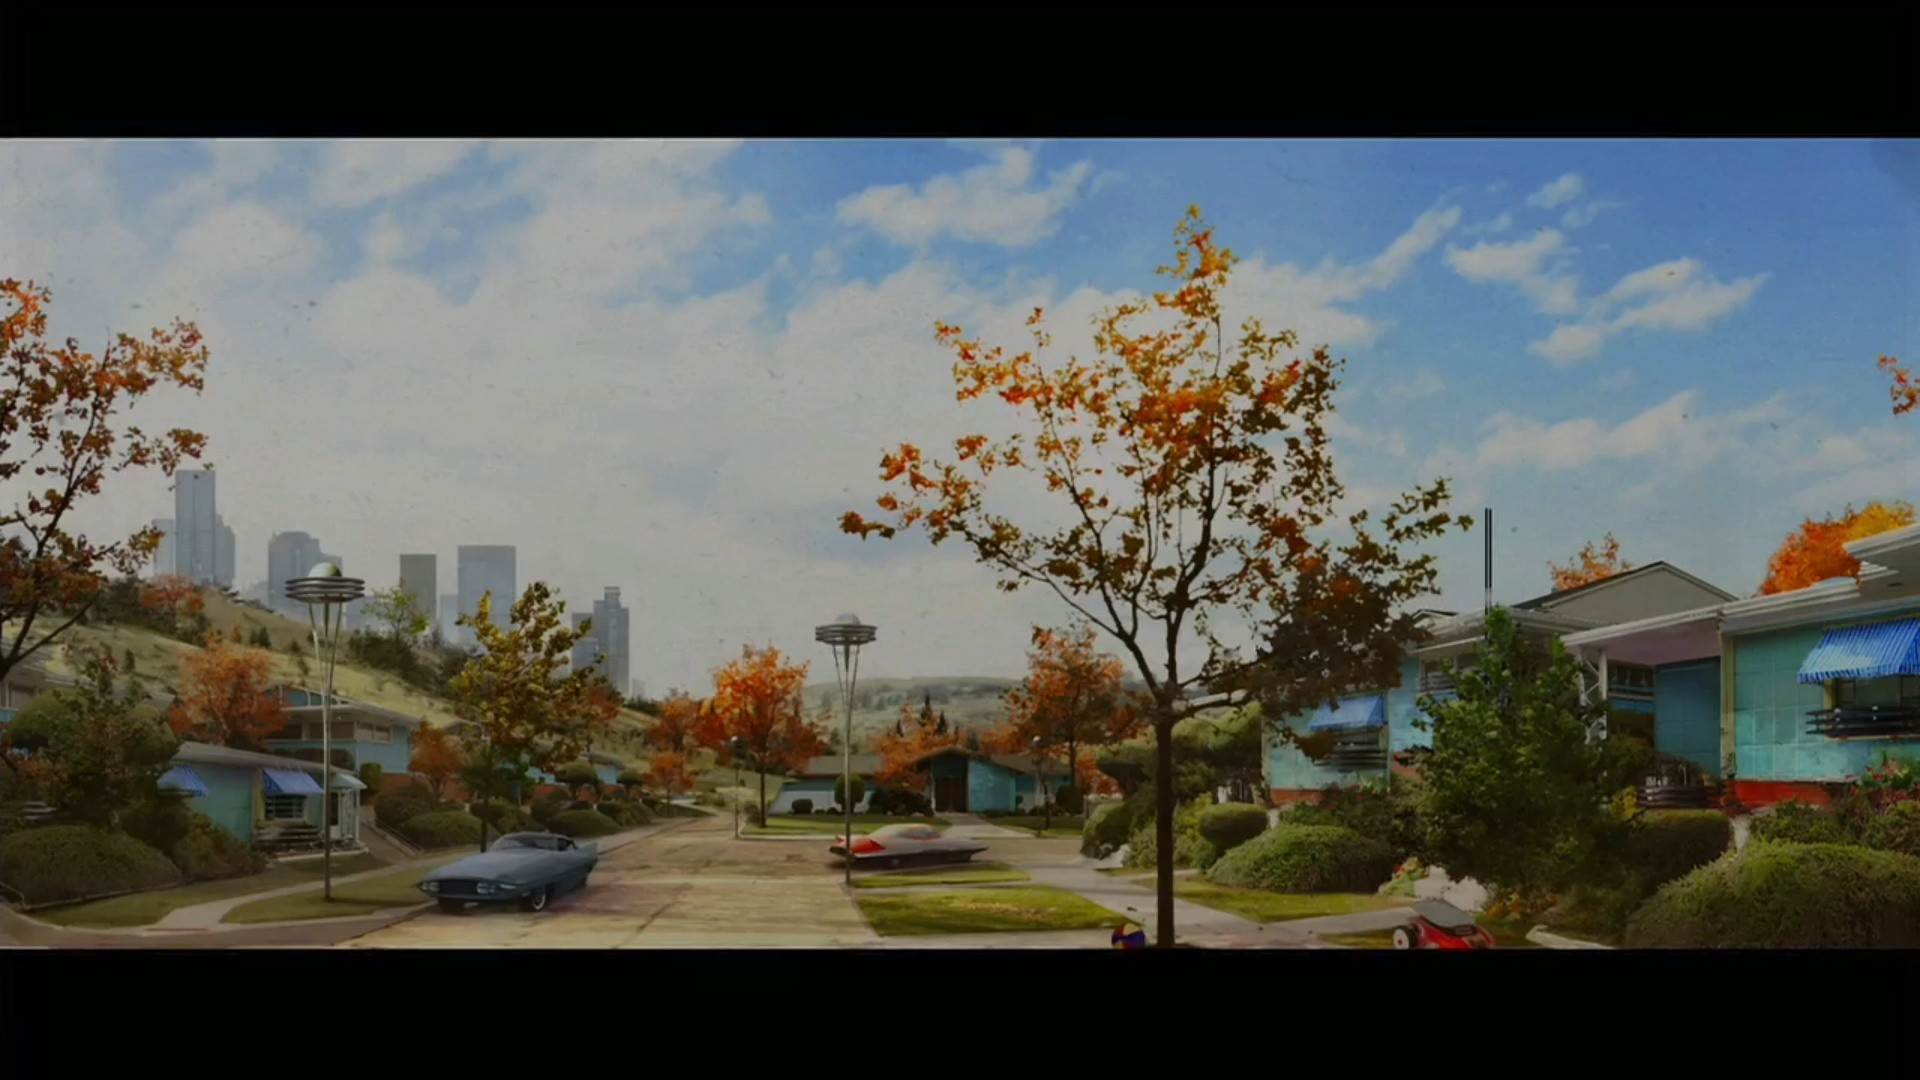 Filename: Fallout-4-Concept-Art-51.jpg